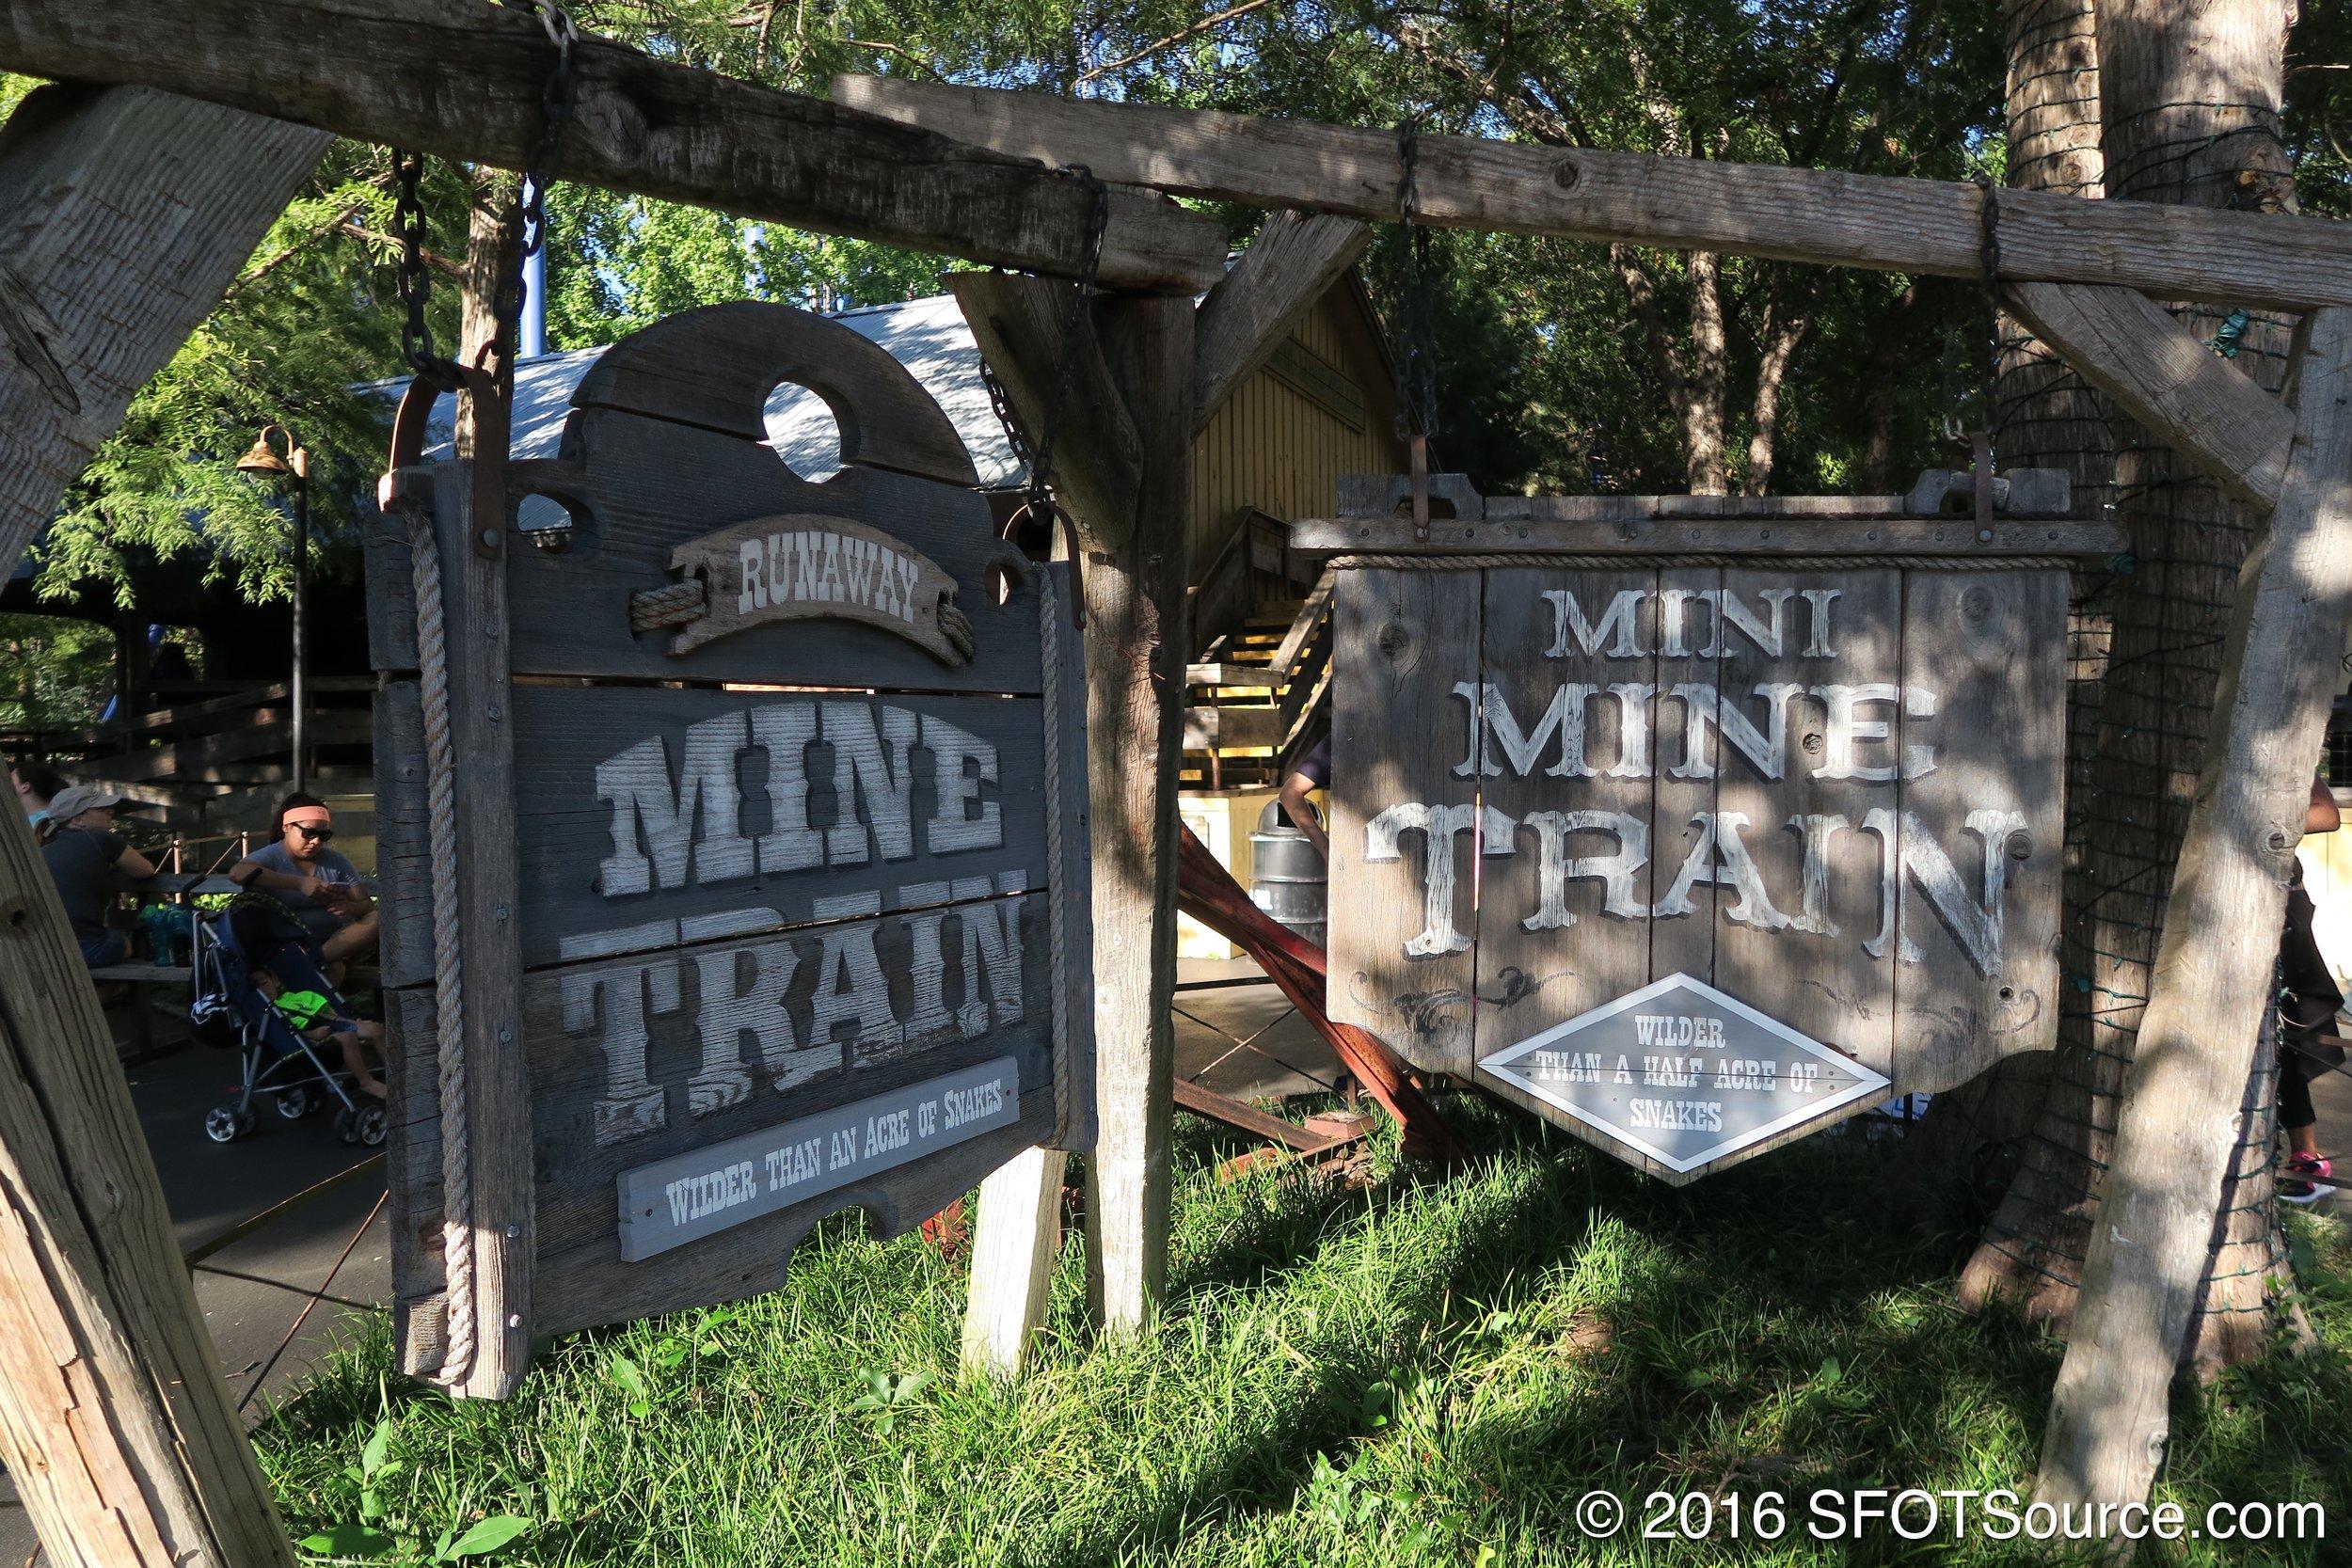 Mini Mine Train can be found right next to Runaway Mine Train.